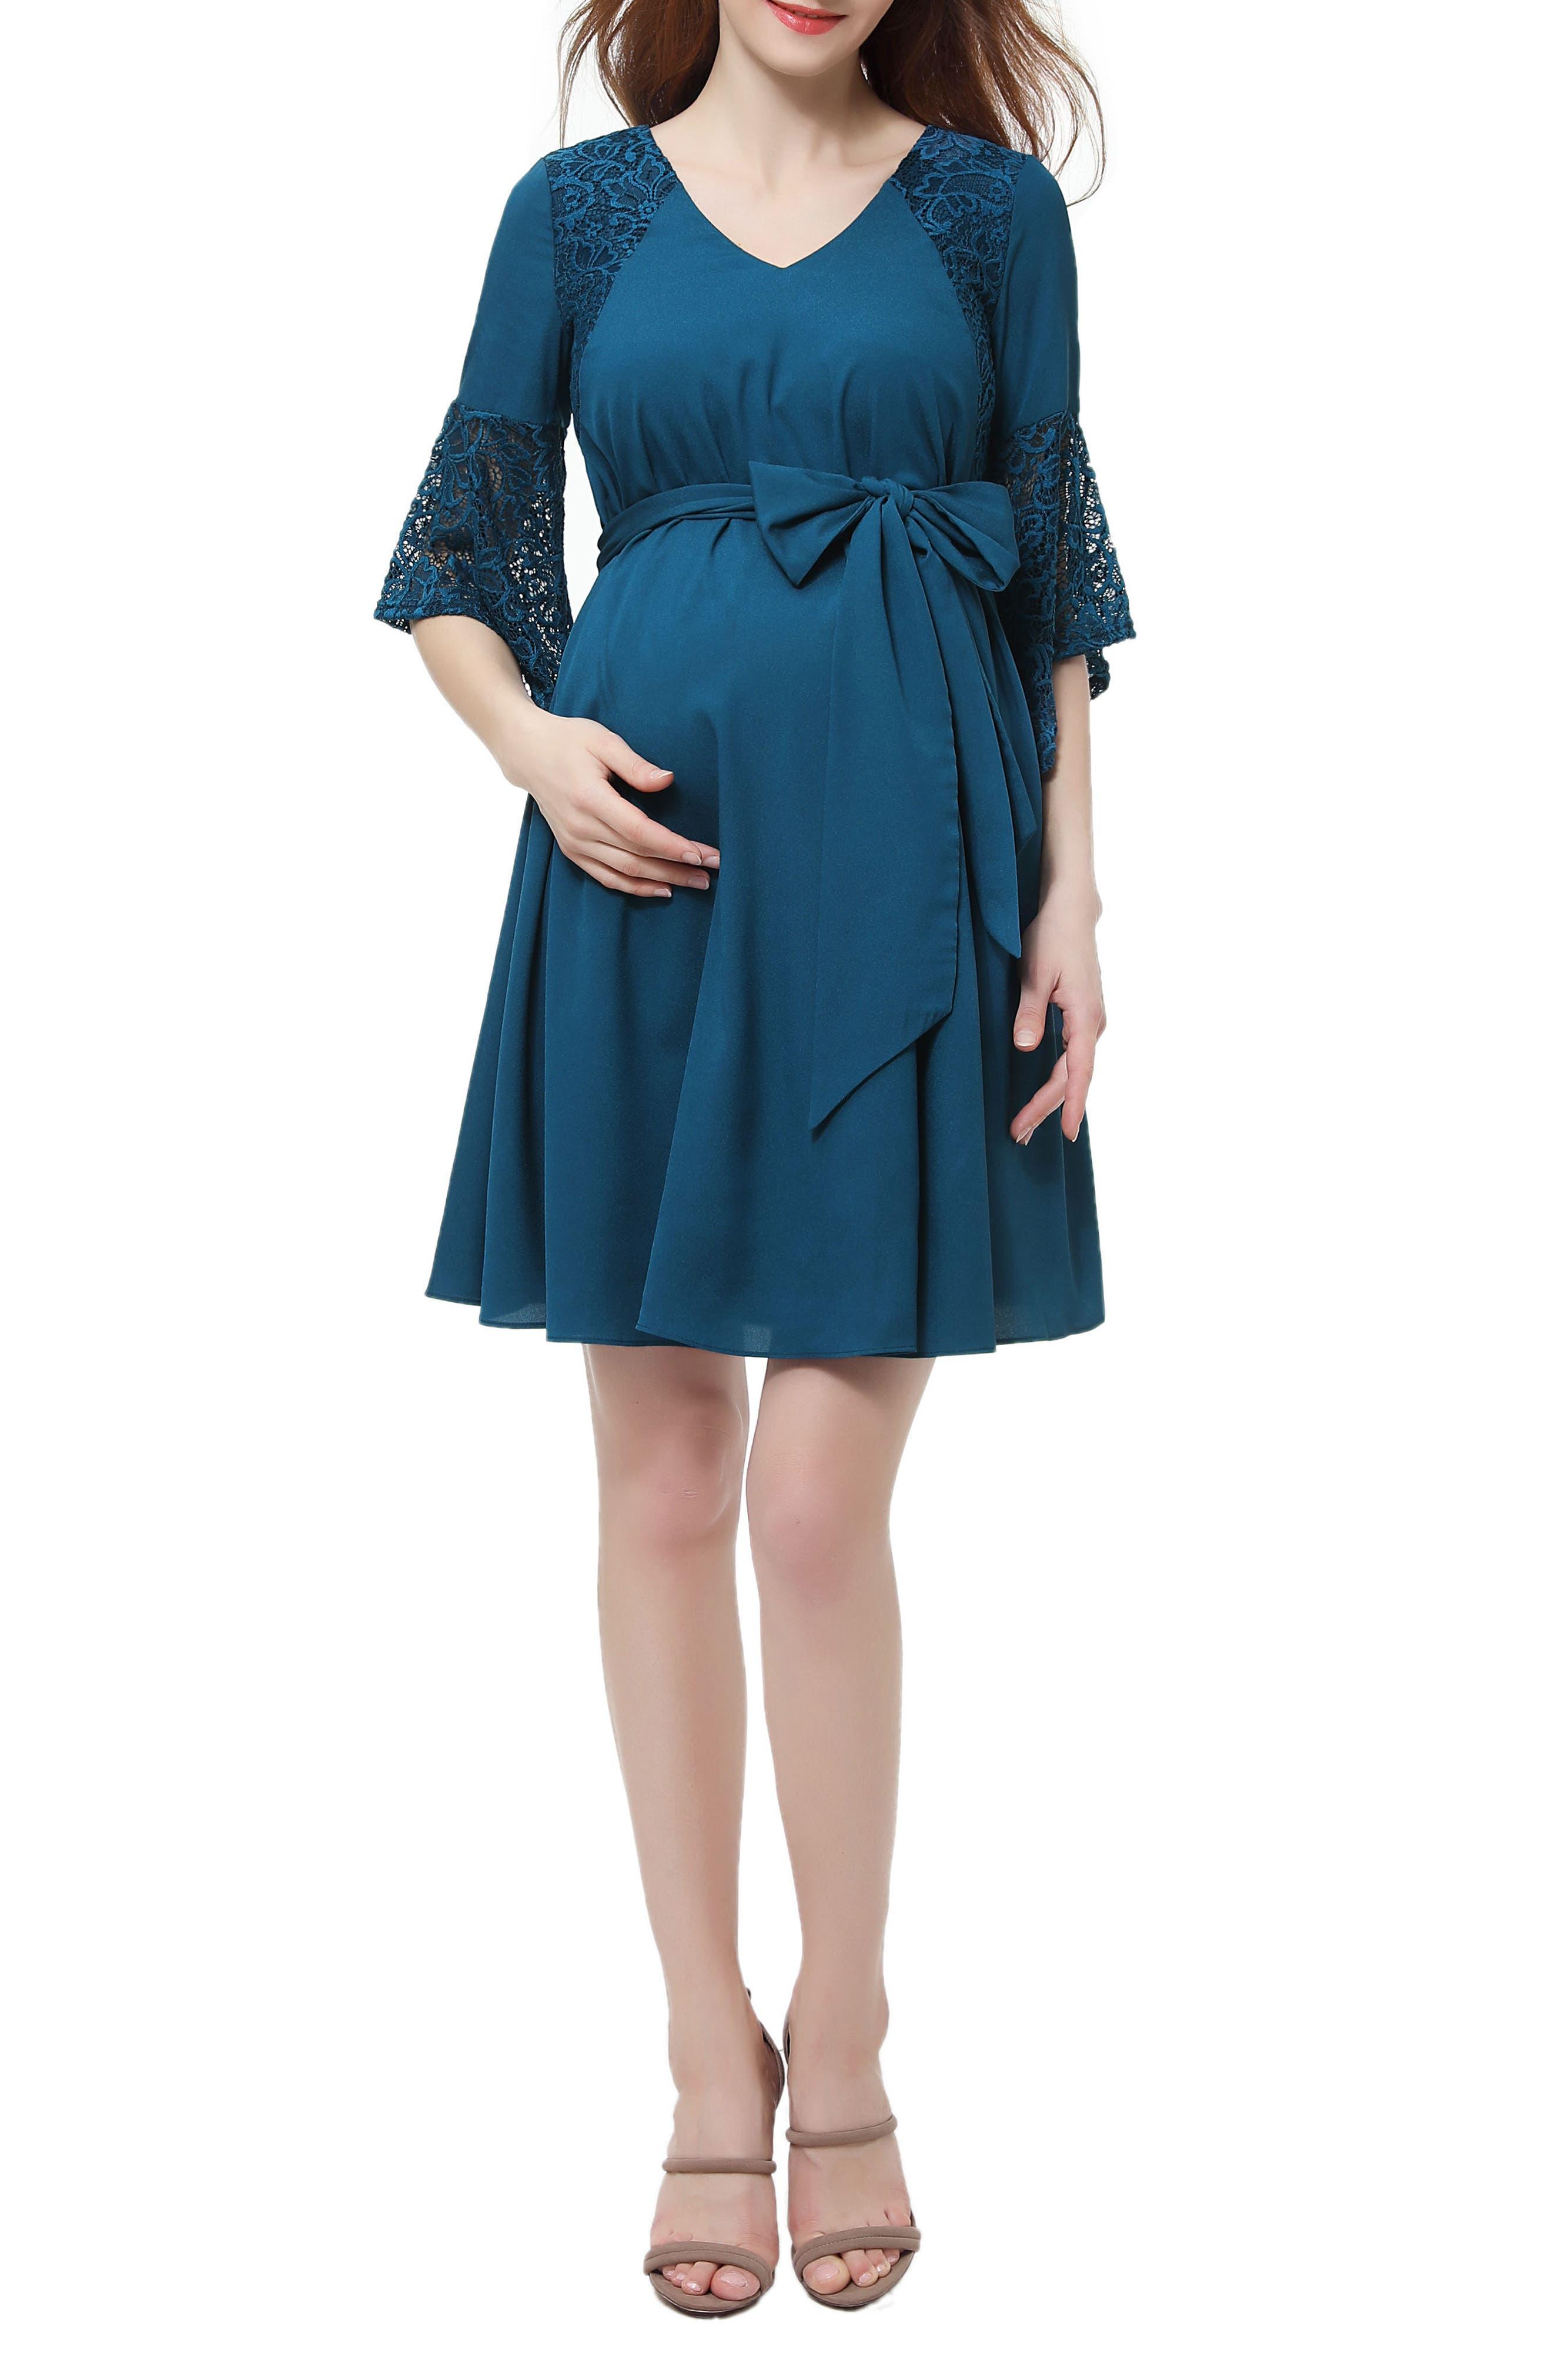 Kimi And Kai Abbey Lace Trim Maternity Dress, Blue